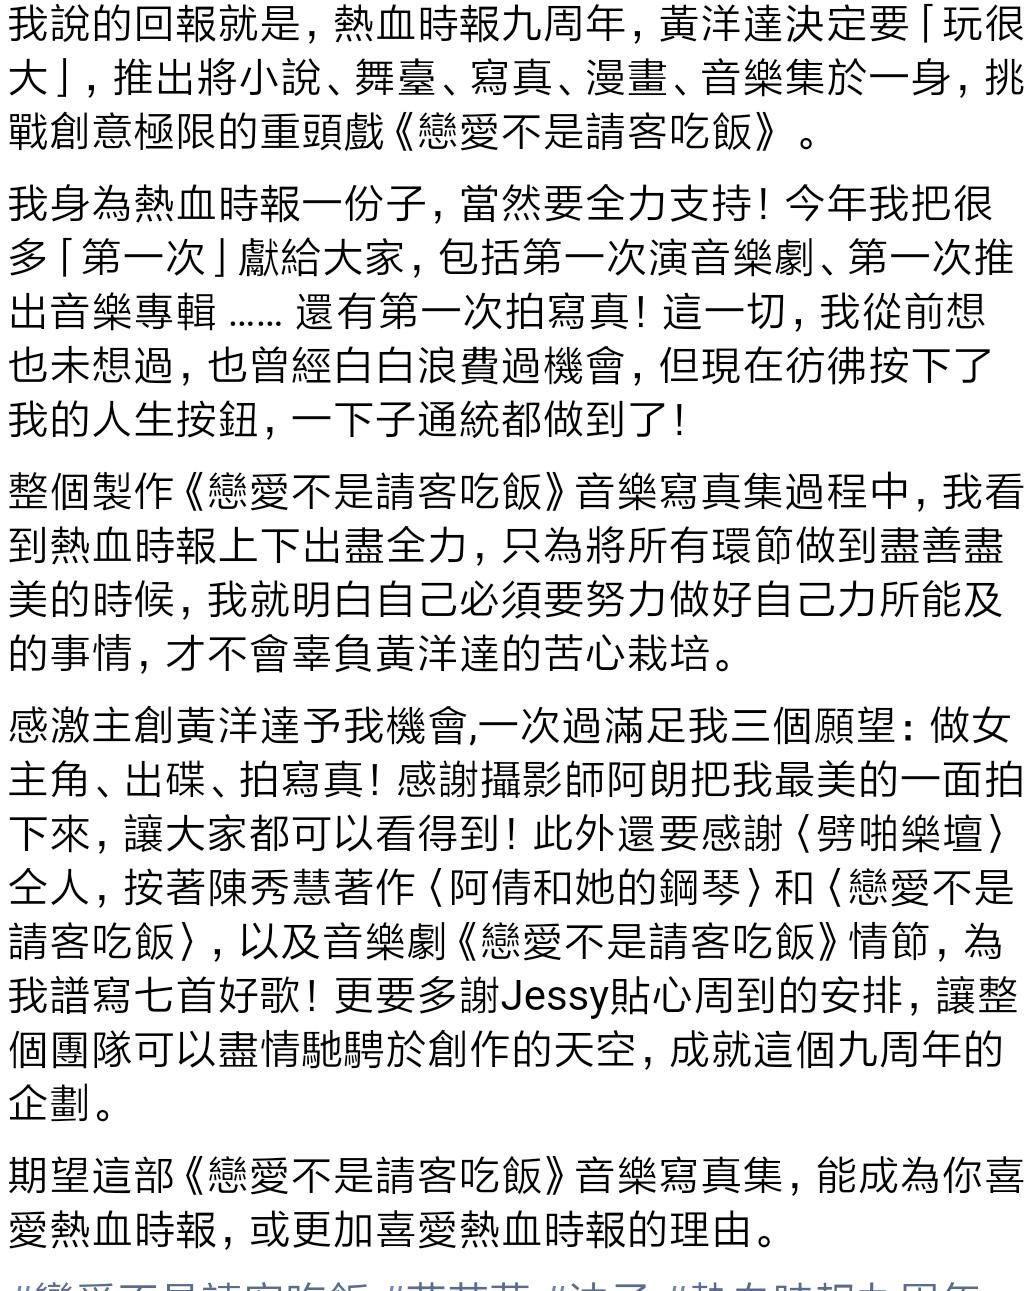 https://upload.hkgolden.media/comment/dmfal2xt.sthi3ofr4eh.xmz3dmdsl2d.mb4.jpg